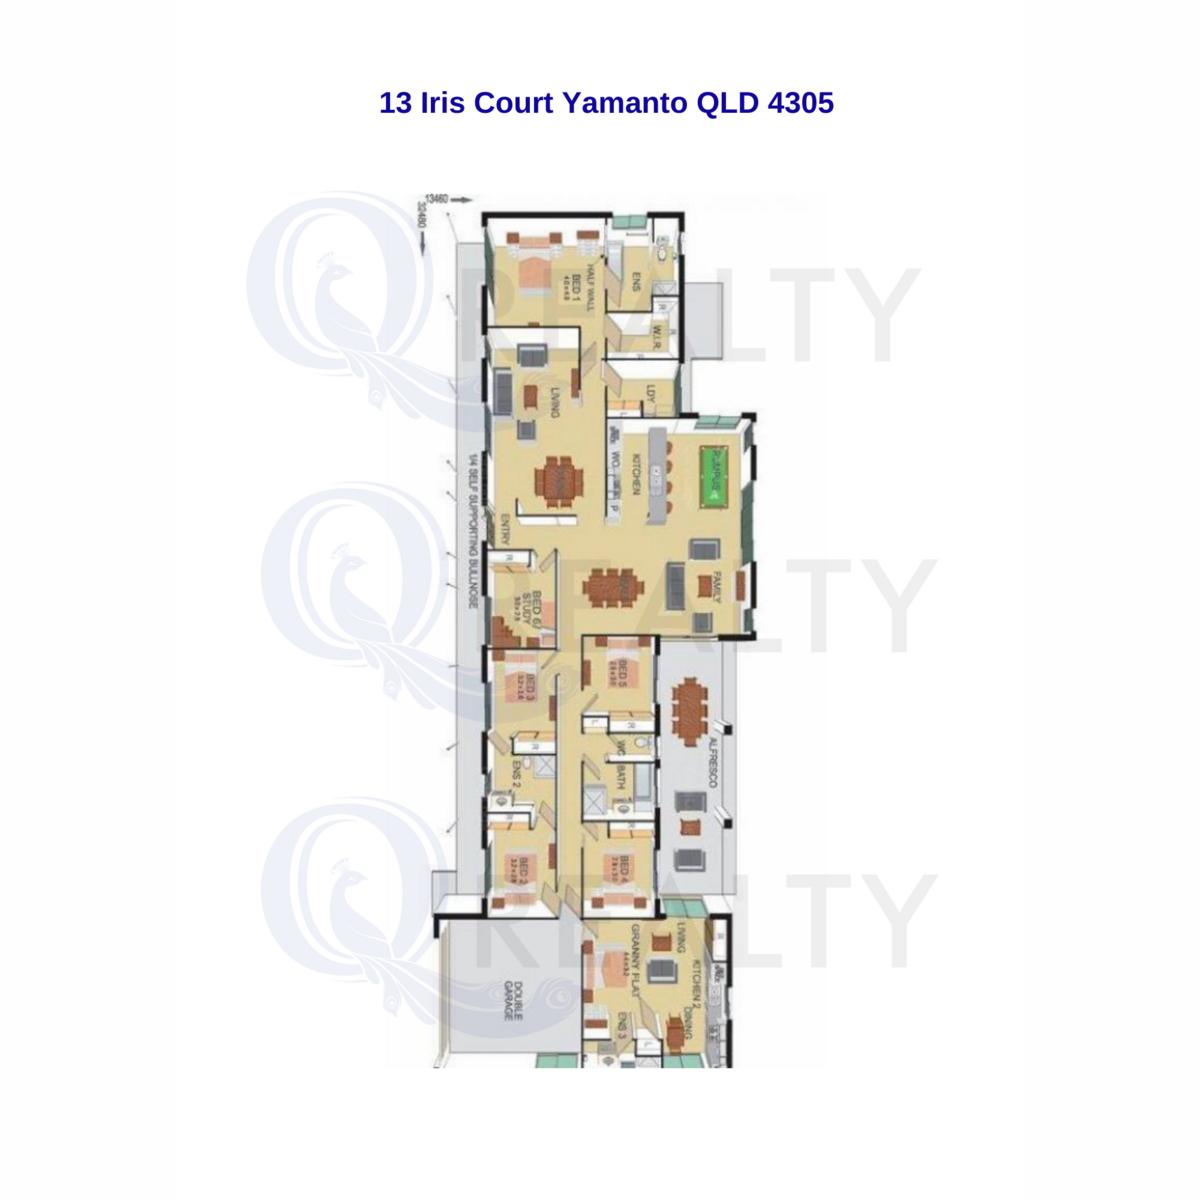 13 Iris Court, Yamanto  QLD  4305